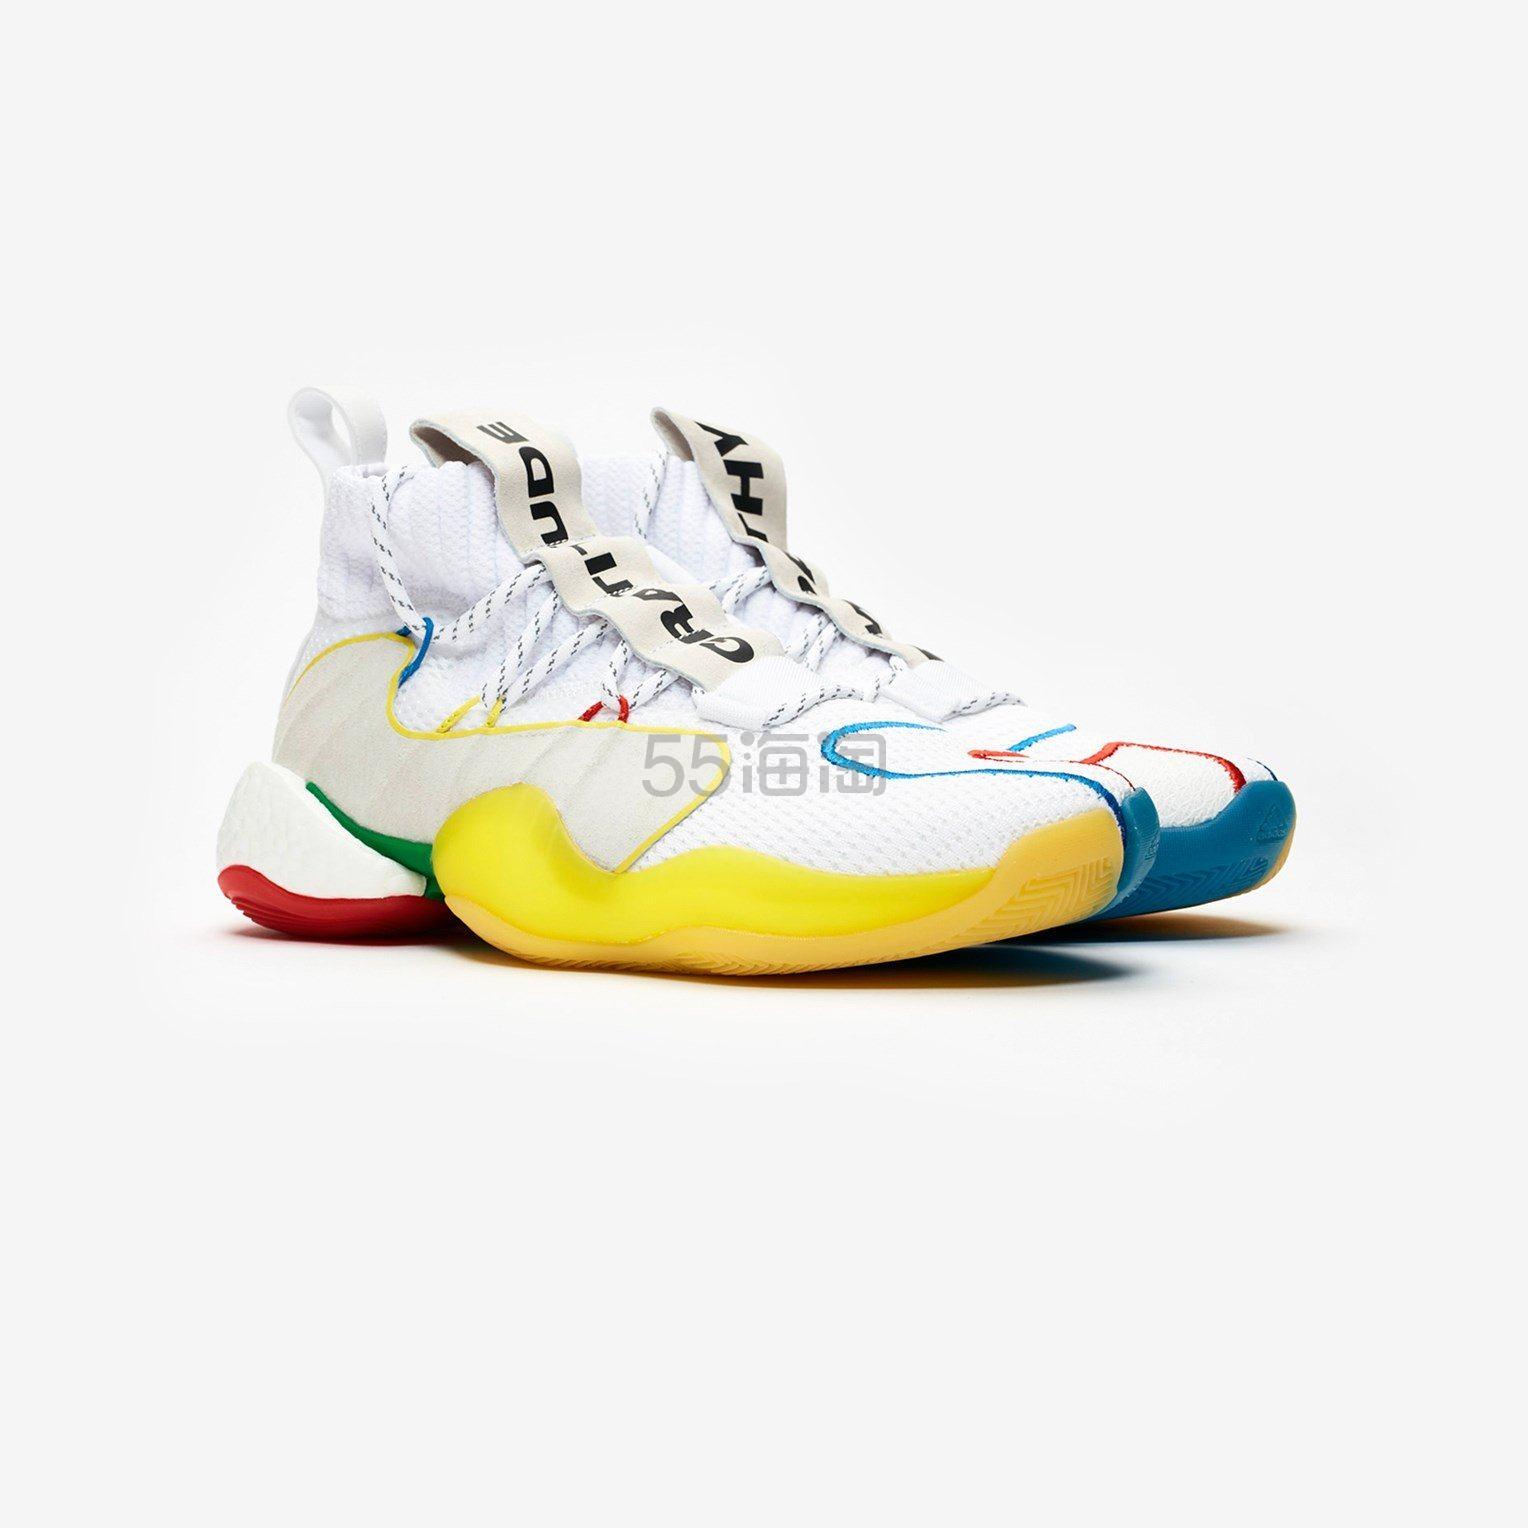 adidas by Pharrell Williams Crazy BYW LVL X PW 男士篮球鞋 4.5(约863元) - 海淘优惠海淘折扣 55海淘网